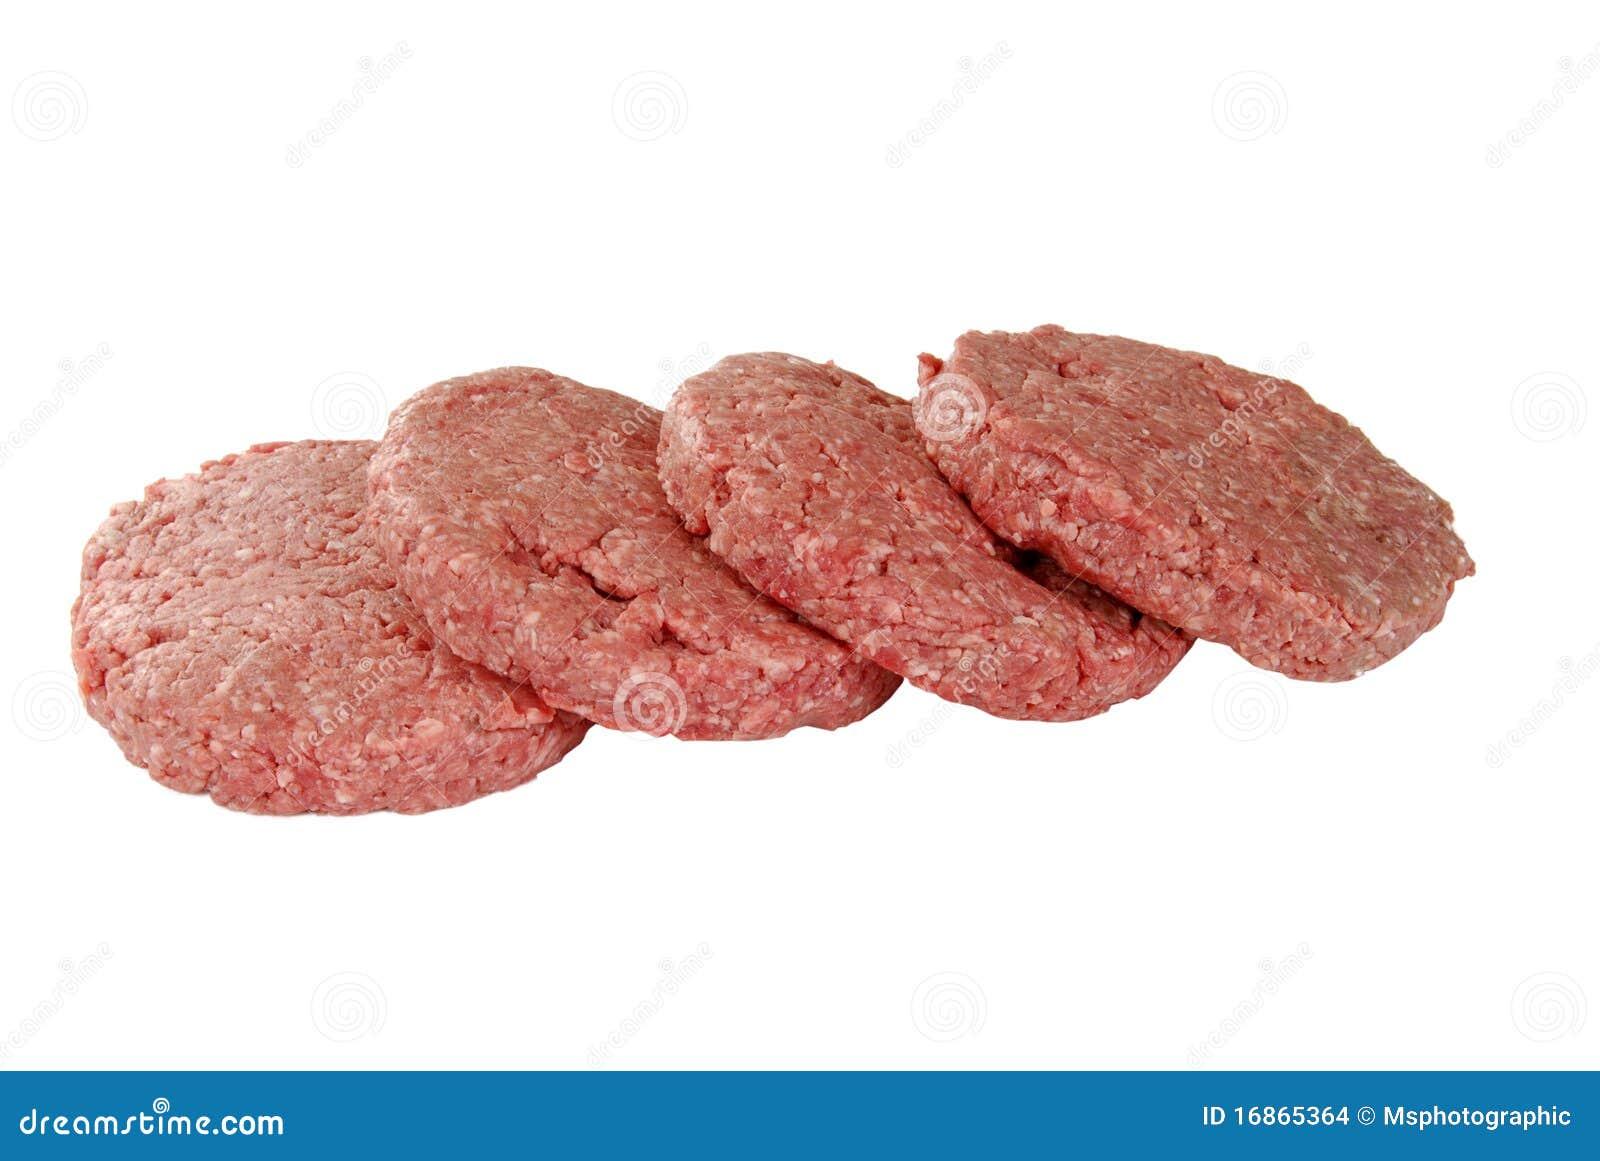 Rissóis do Hamburger